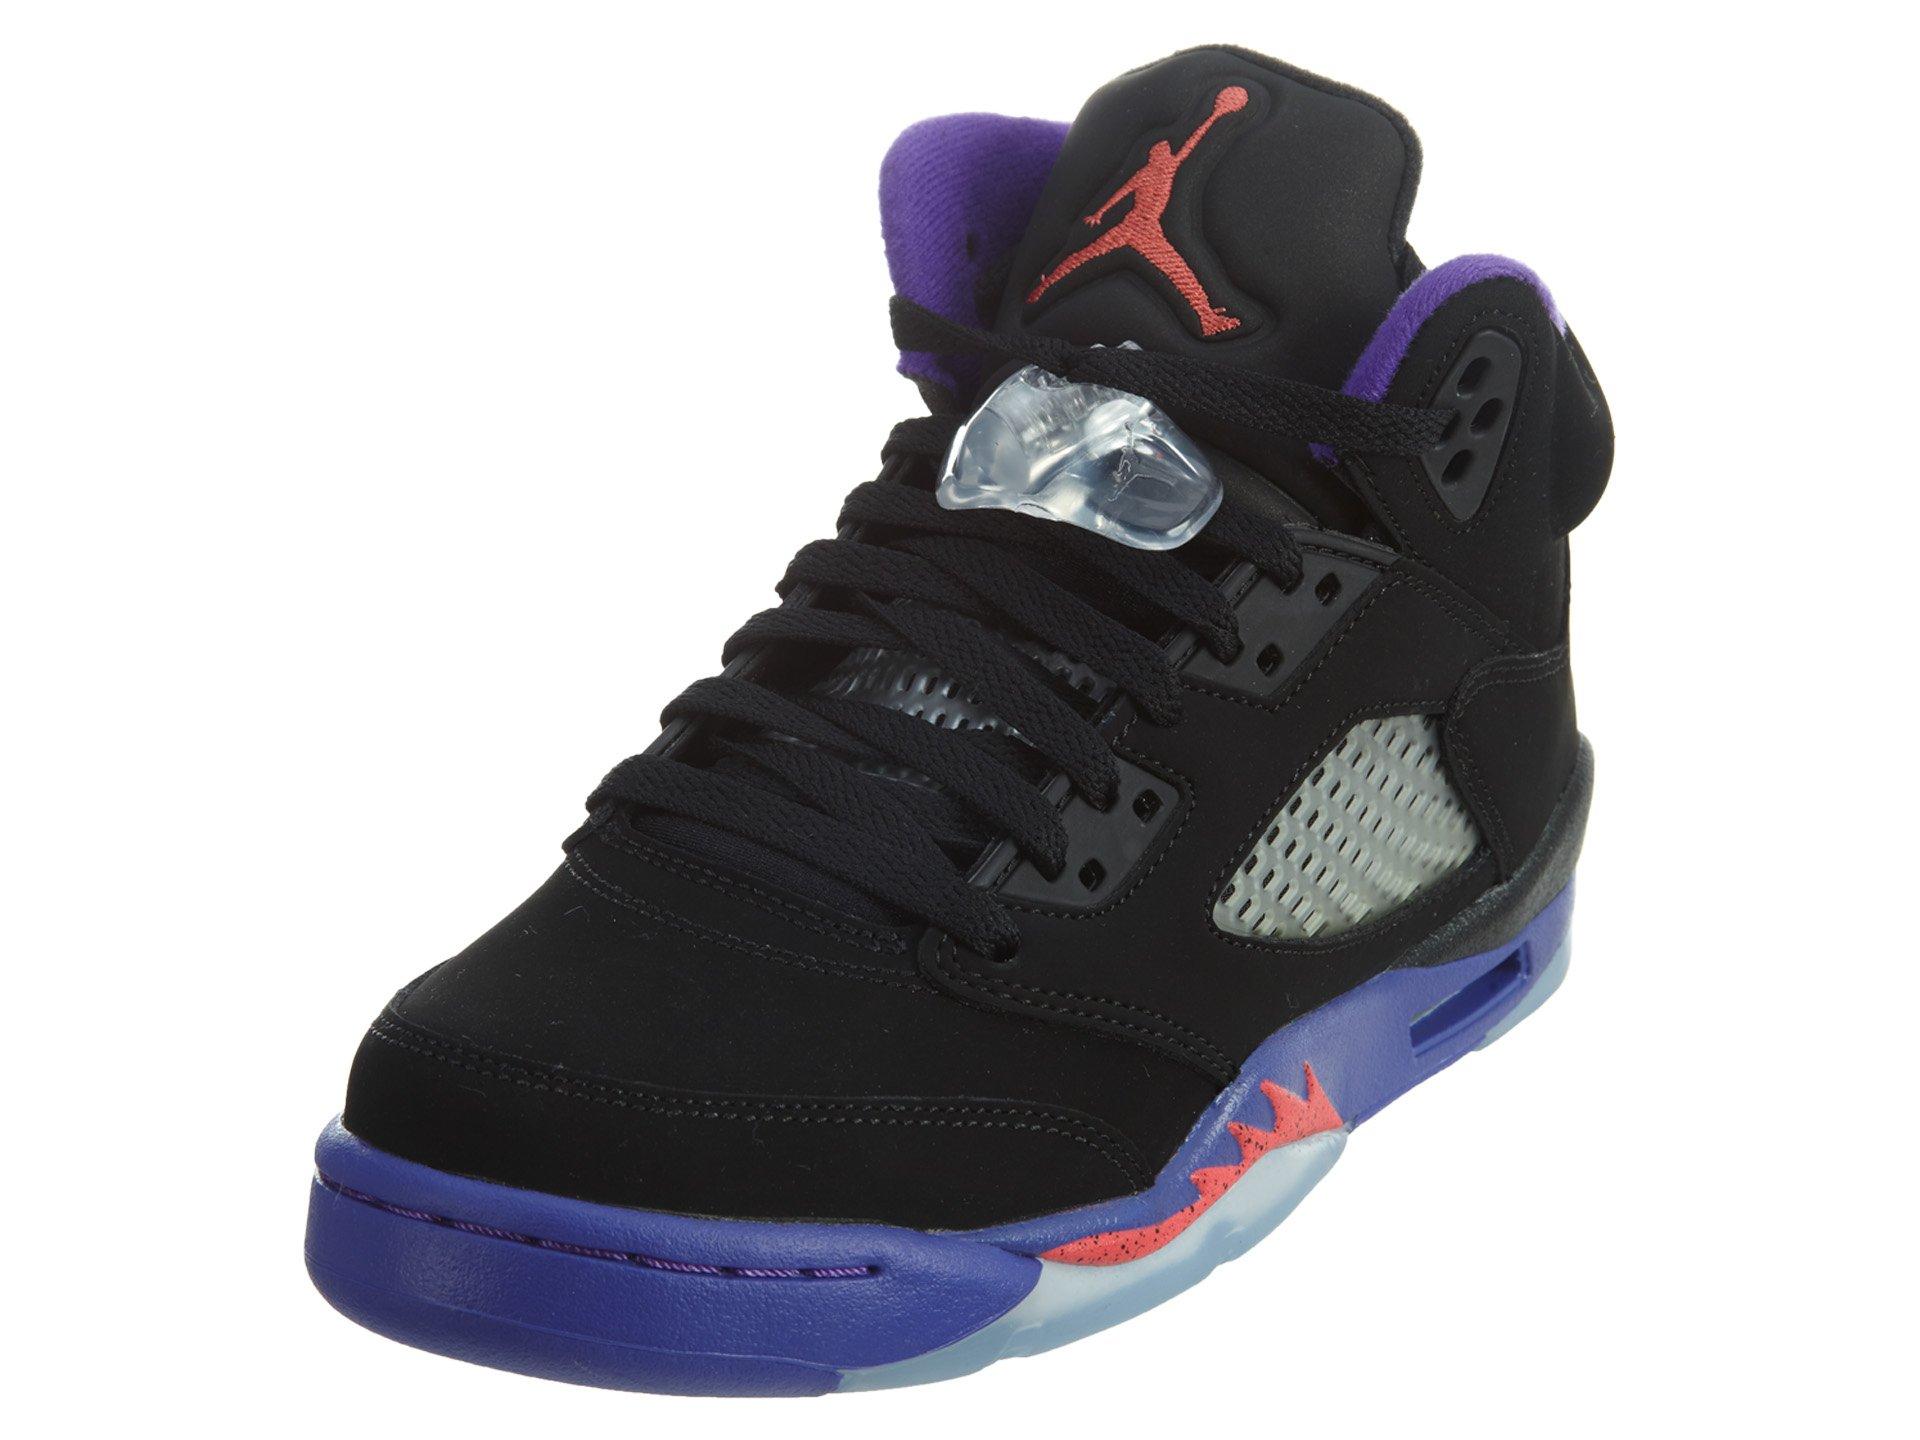 NIKE Girls Air Jordan 5 Retro GG Raptor Black/Ember Glow-Fierce Purple Leather Size 7Y